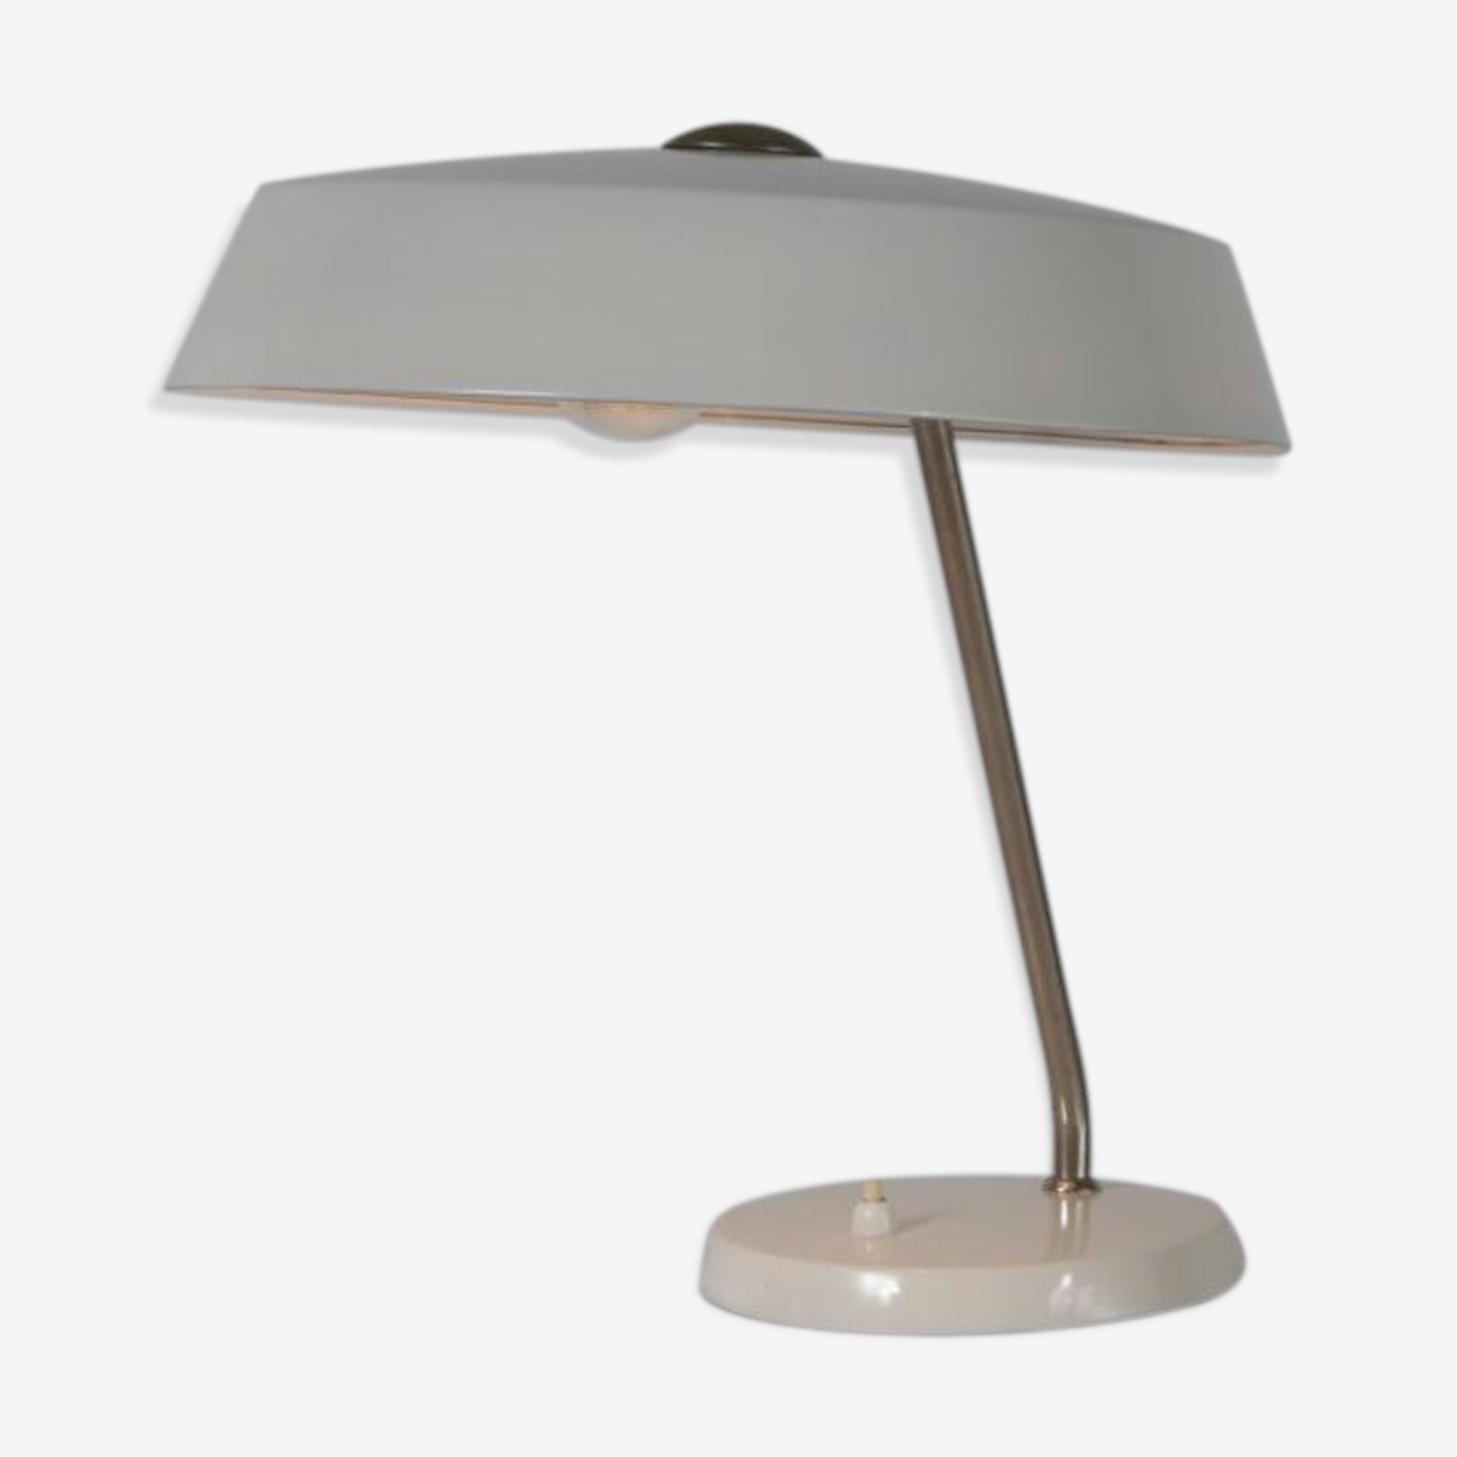 Lampe de bureau desing néerlandais